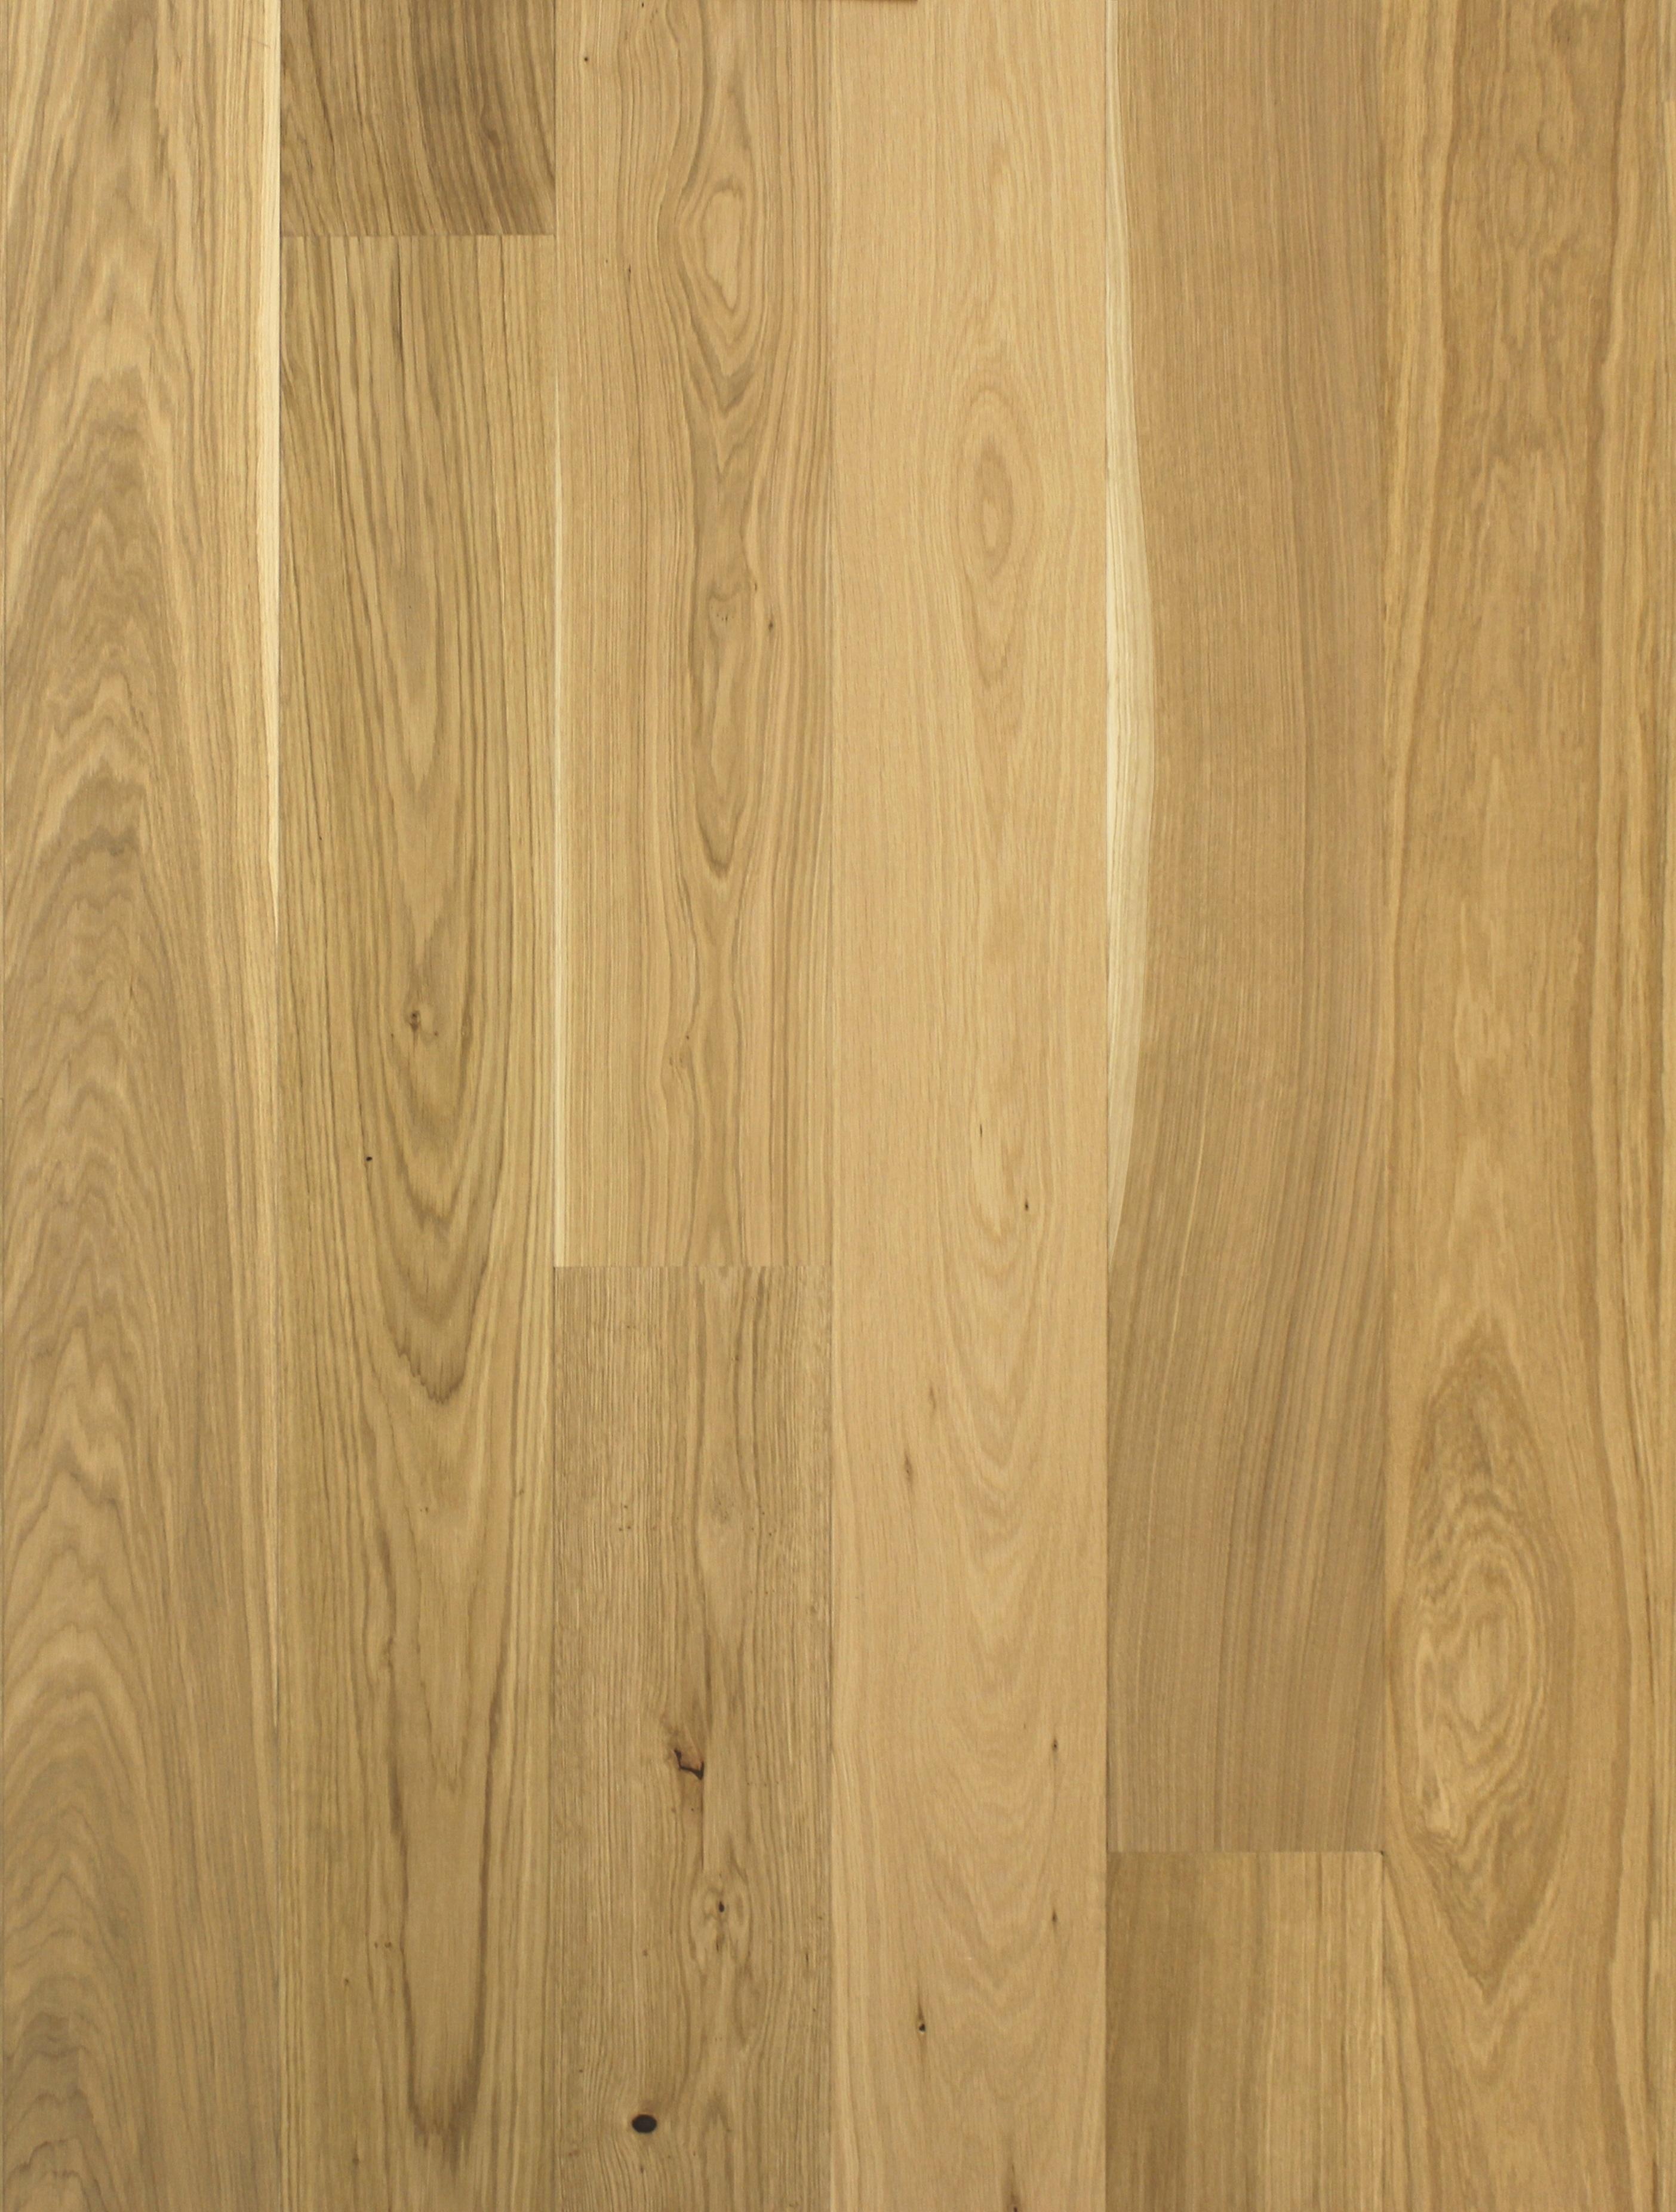 97231 karelia landhaus eiche basic 2 bild mayer. Black Bedroom Furniture Sets. Home Design Ideas